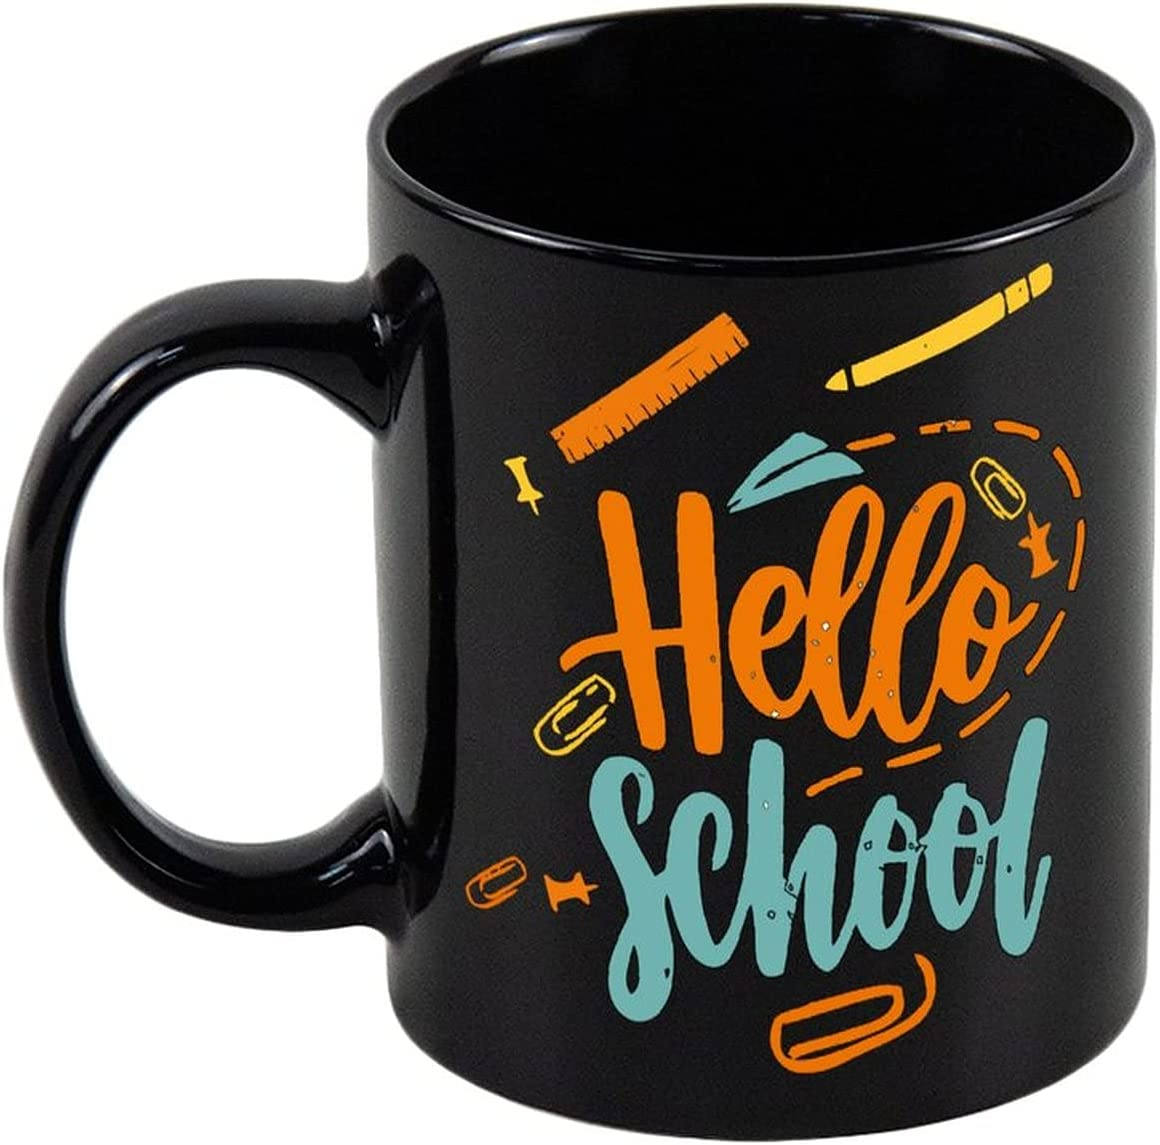 Aihesui San Francisco Mall 11 Oz Black Ceramic Tea Coffee As Hello With Don't miss the campaign School Mug